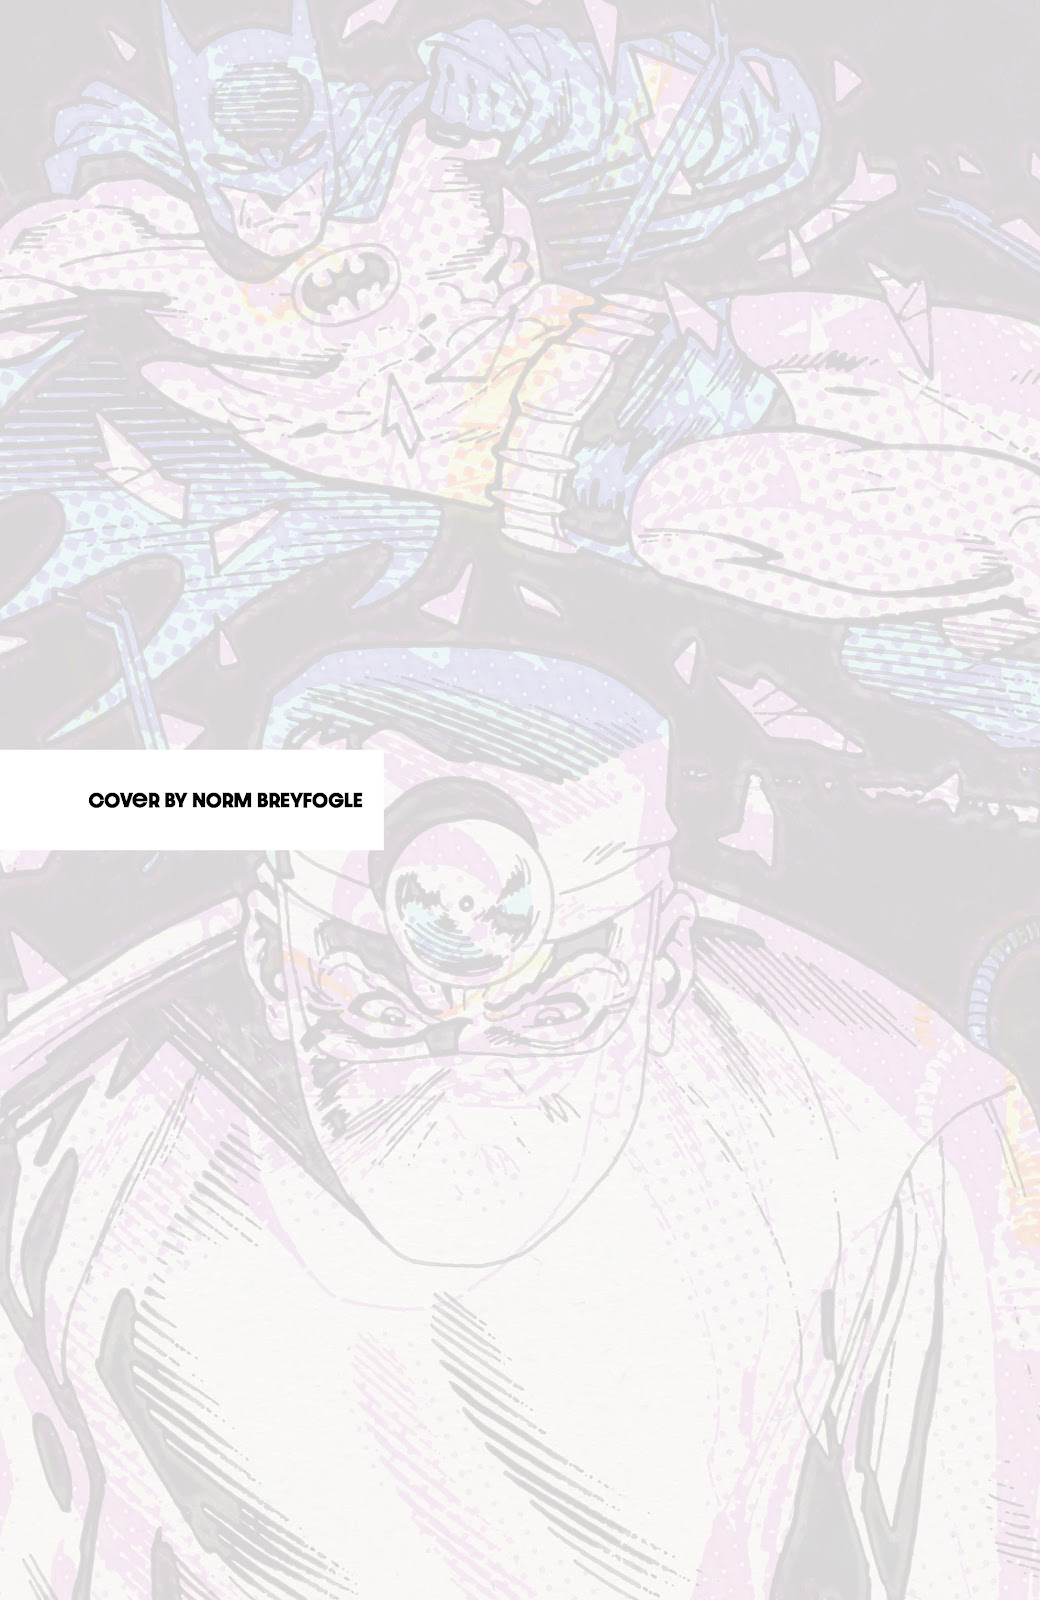 Read online Detective Comics (1937) comic -  Issue # _TPB Batman - The Dark Knight Detective 1 (Part 3) - 6